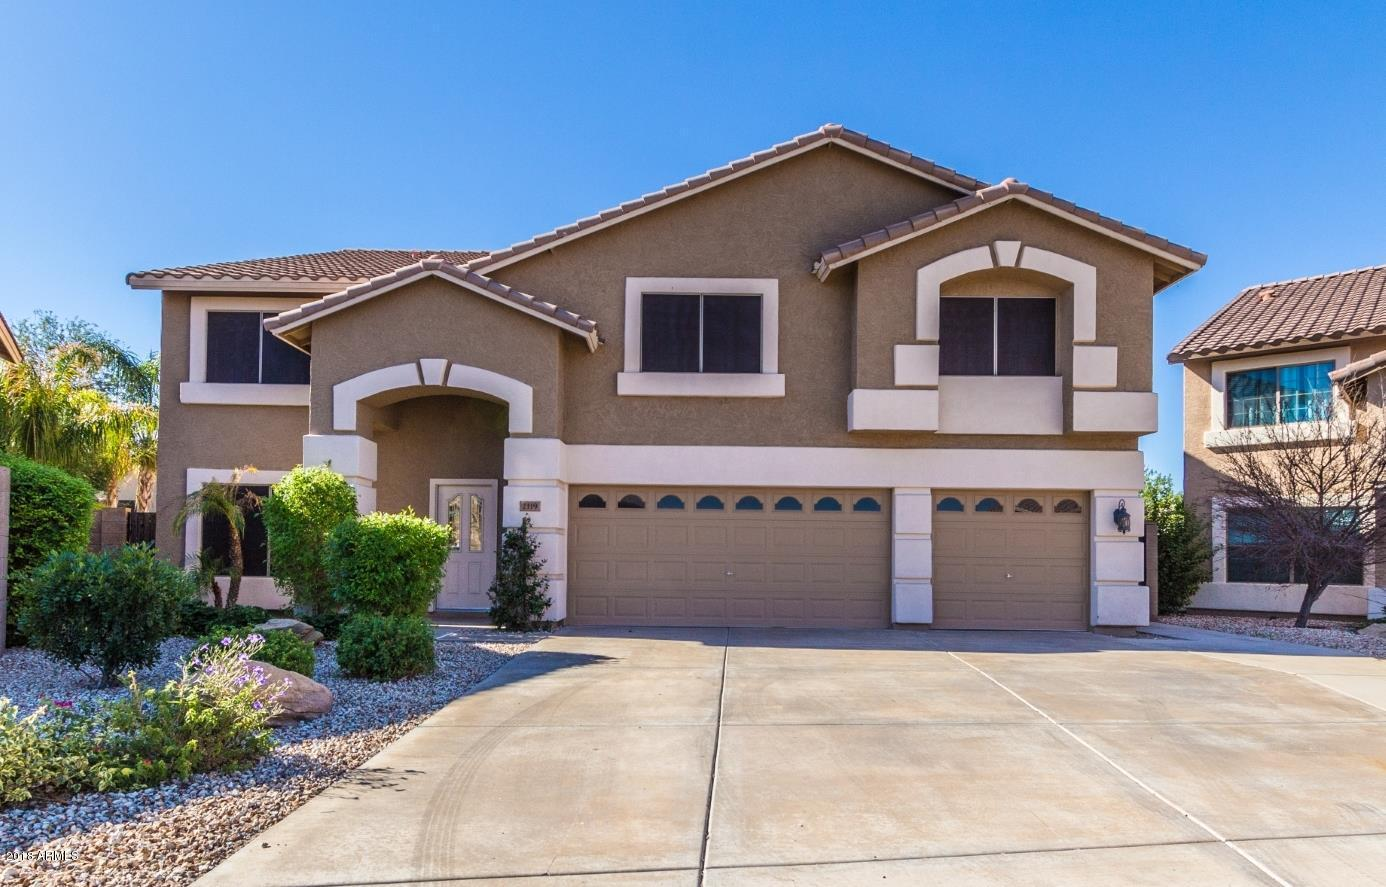 Photo of 2119 E VISTA BONITA Drive, Phoenix, AZ 85024